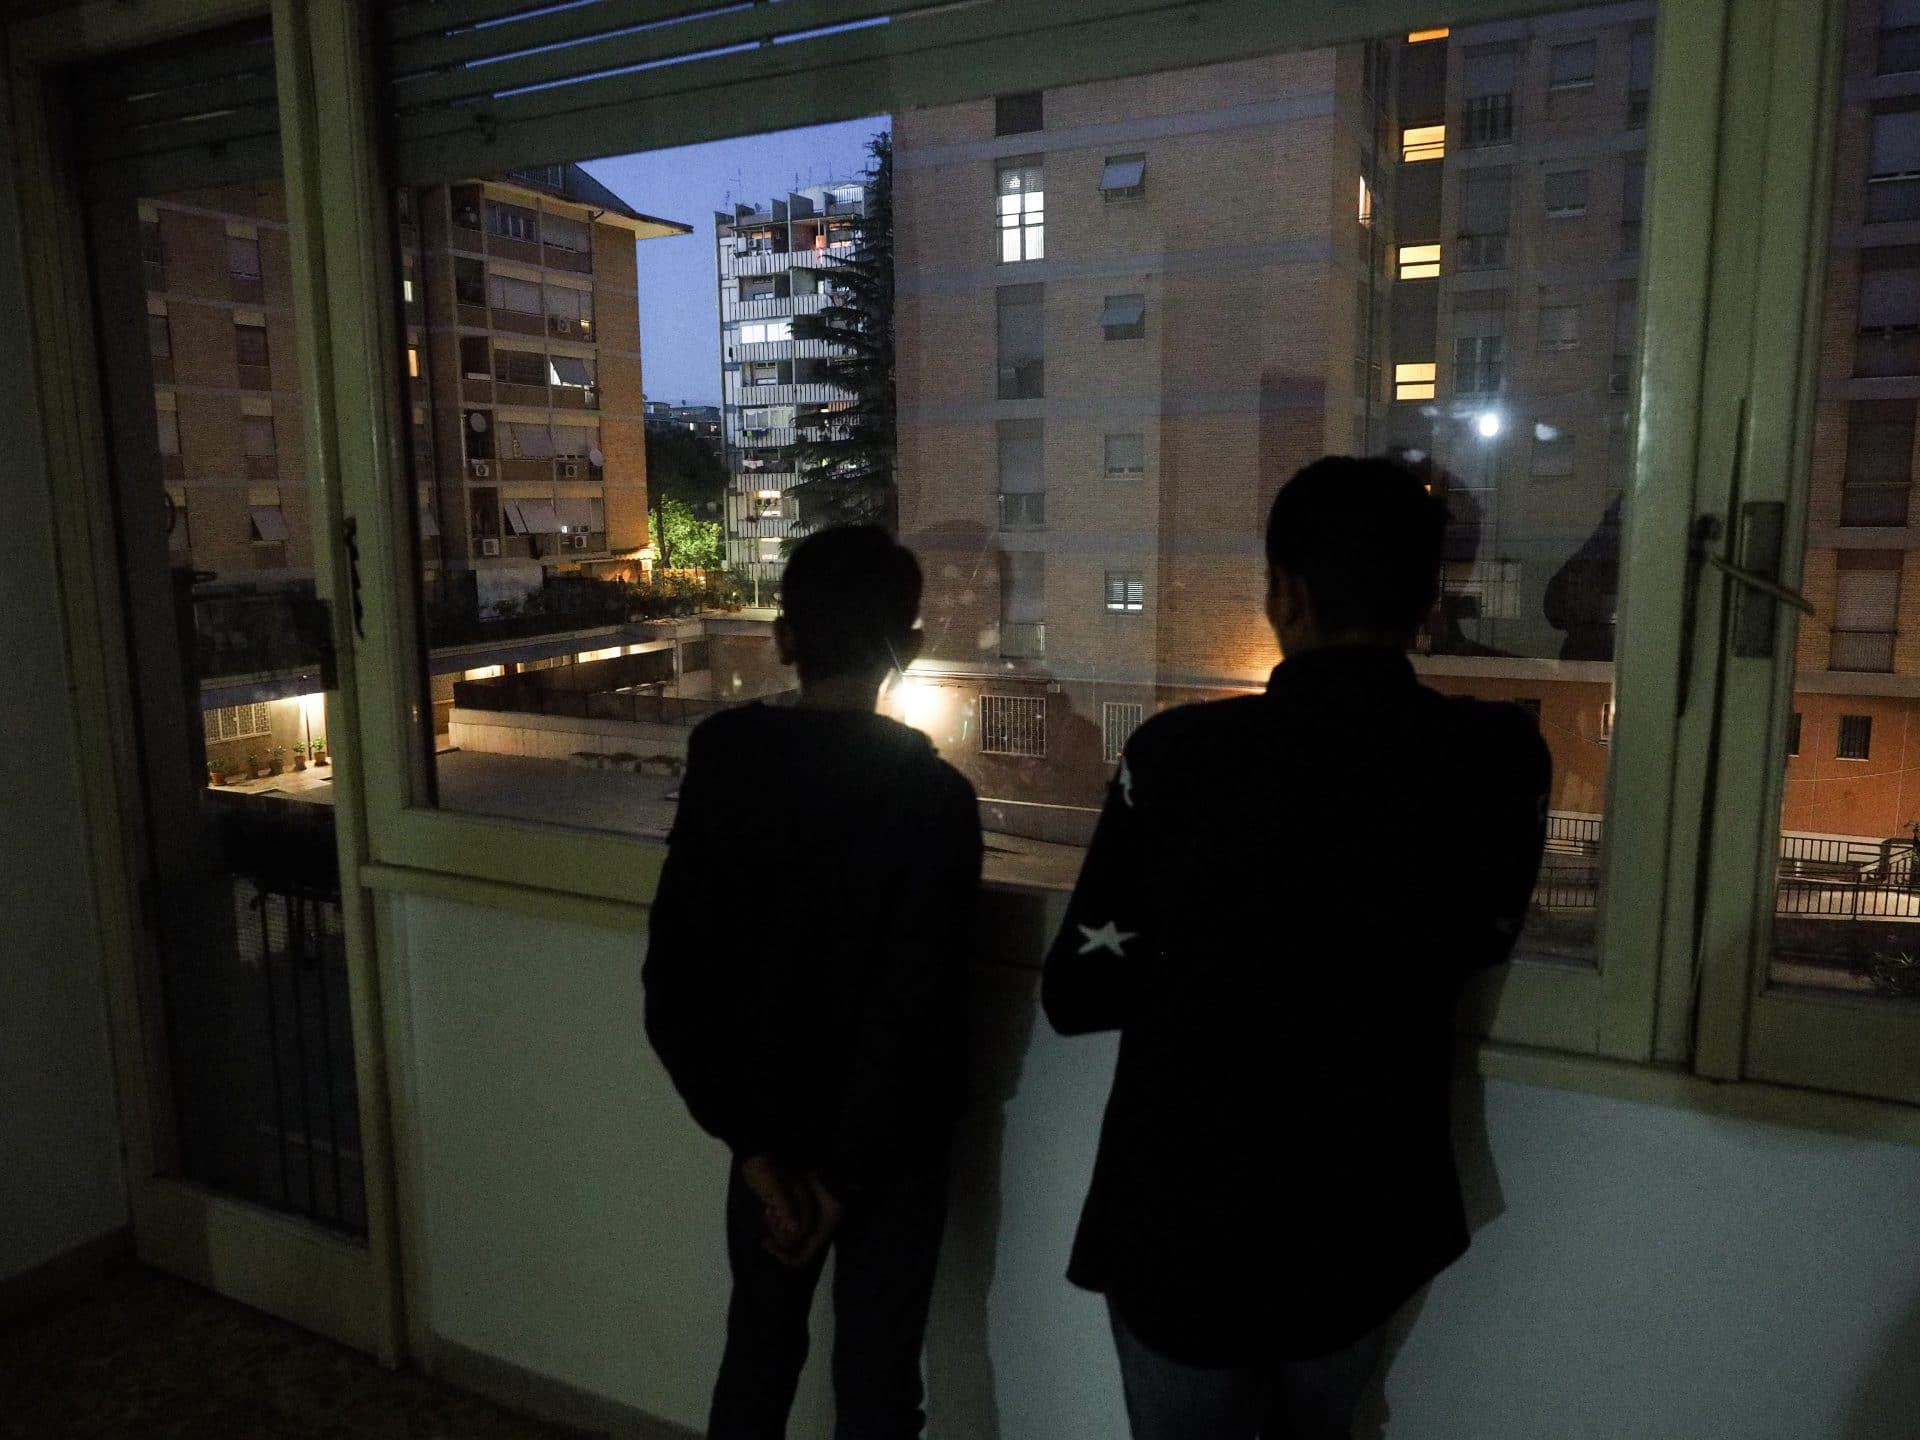 rom casal bruciato